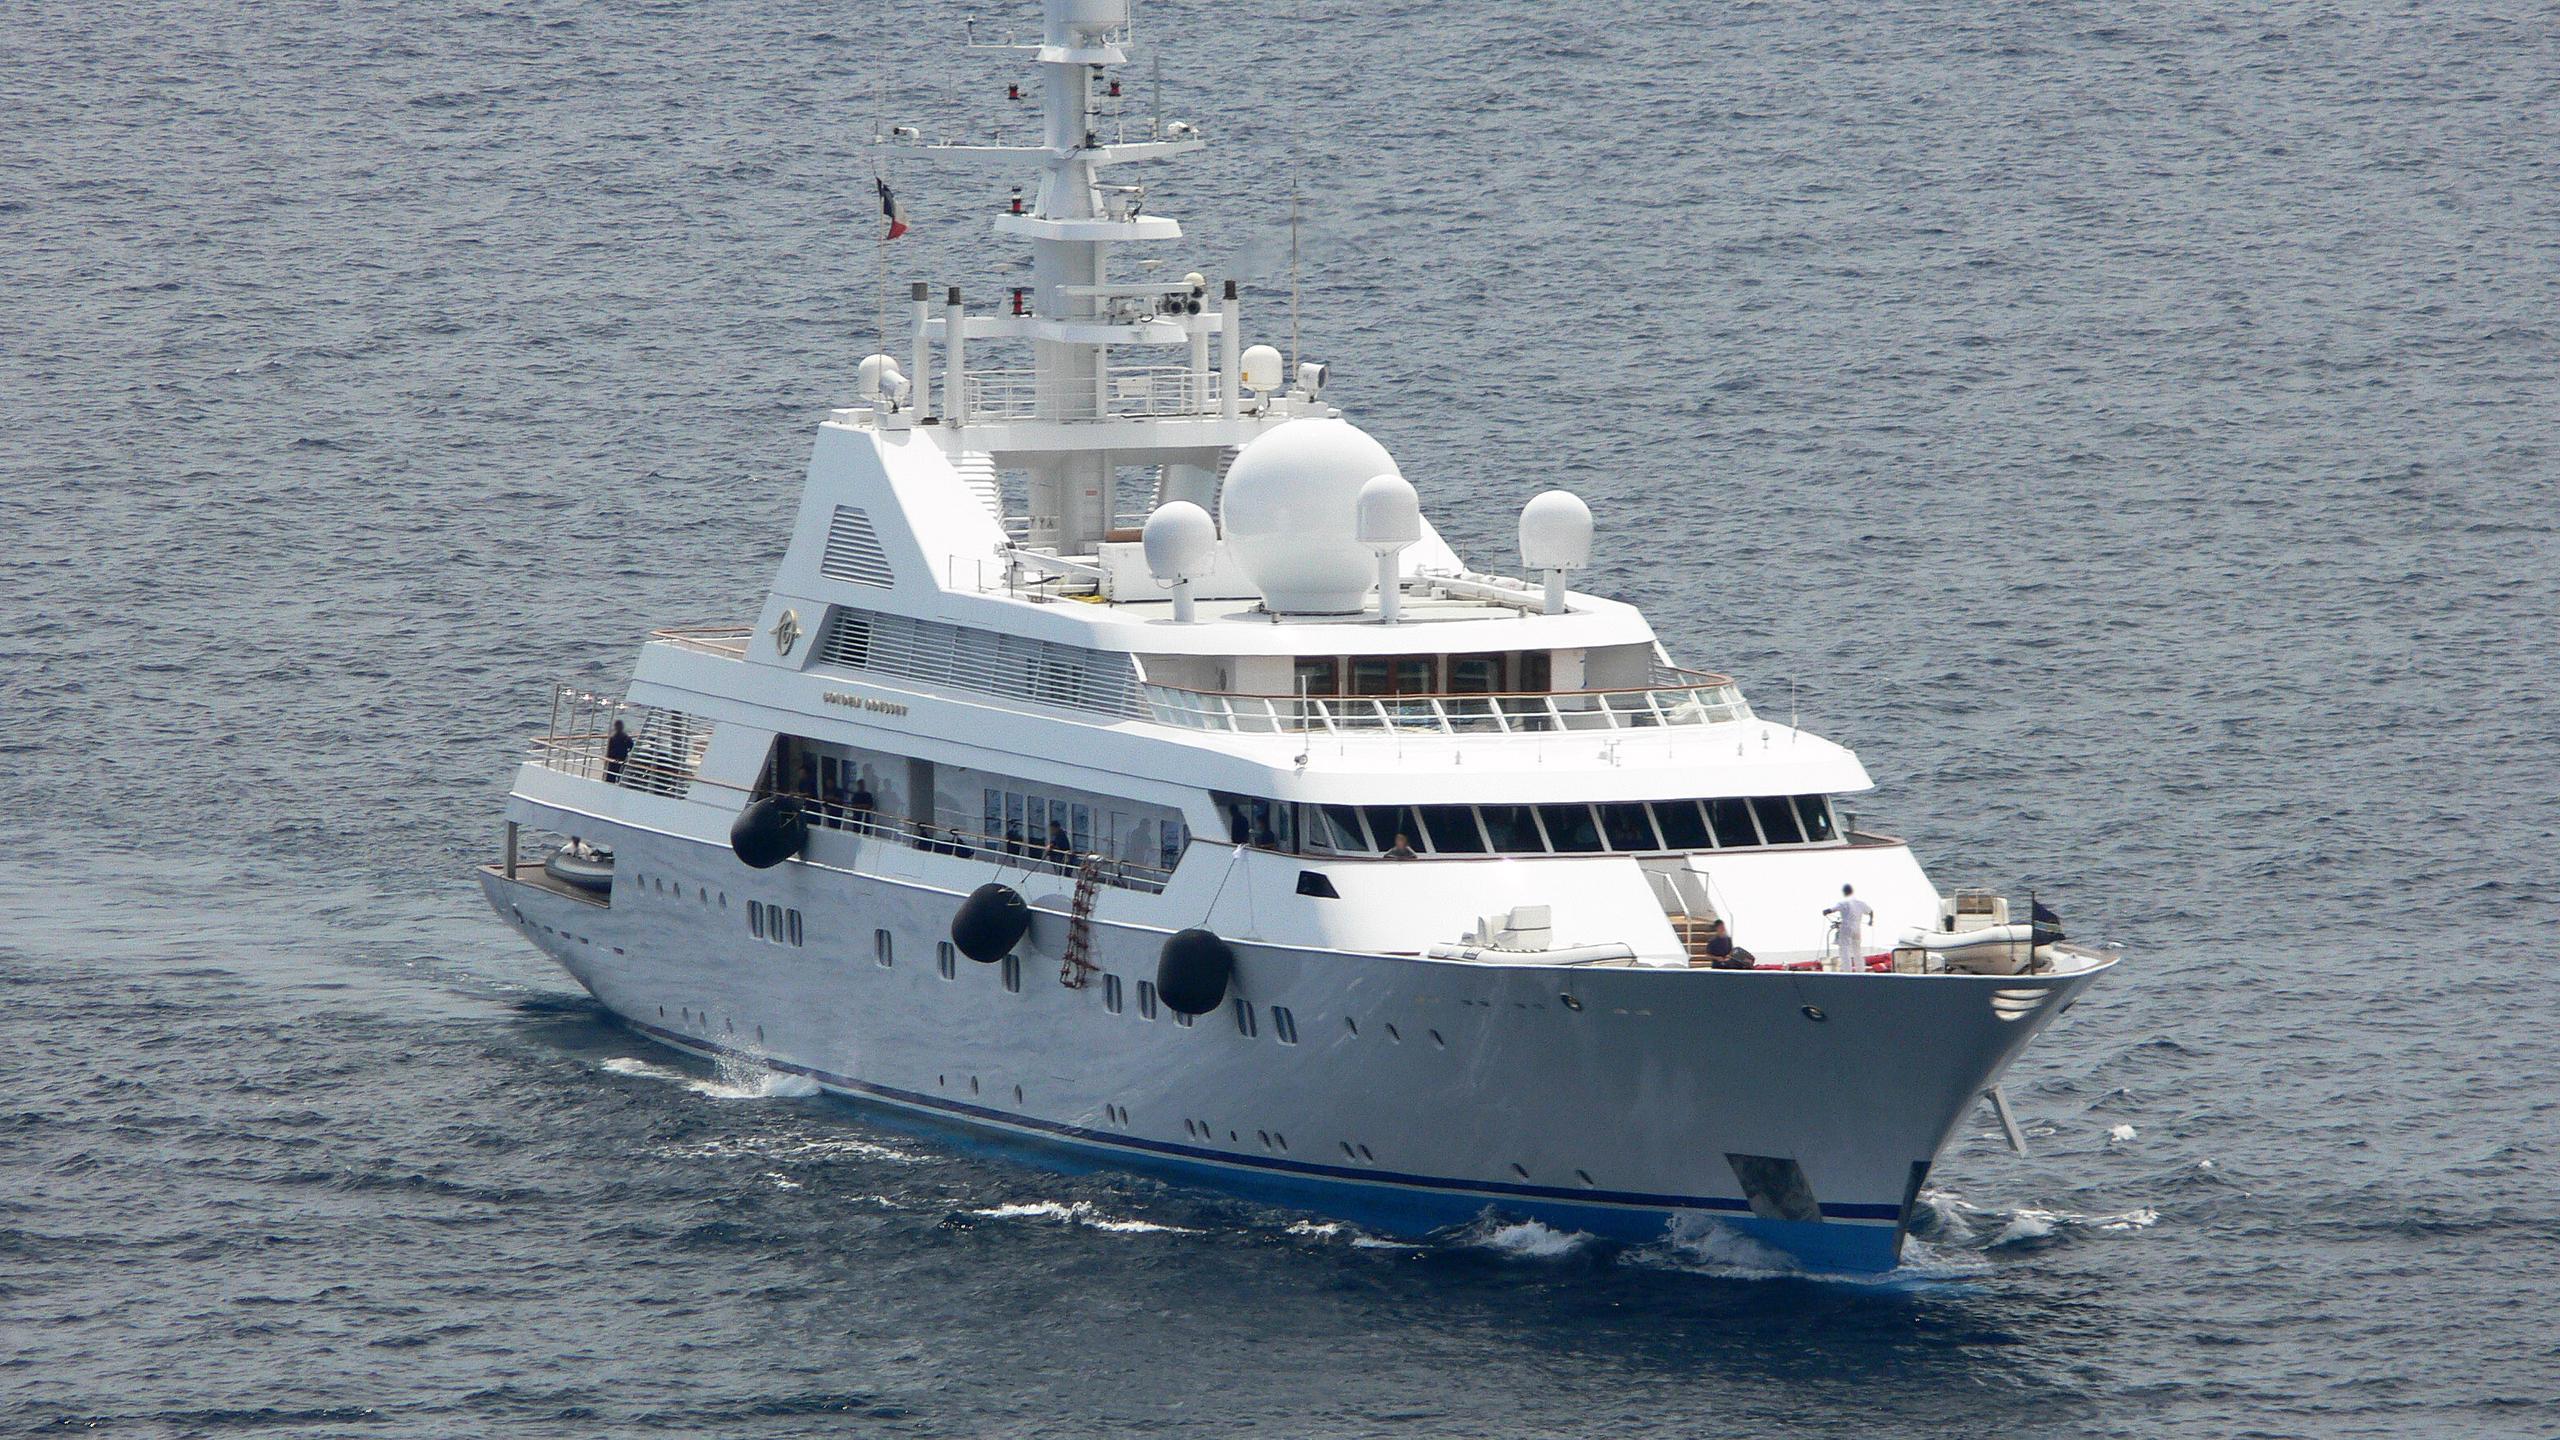 grand-ocean-golden-odyssey-ii-motor-yacht-blohm-voss-1990-80m-cruising-bow